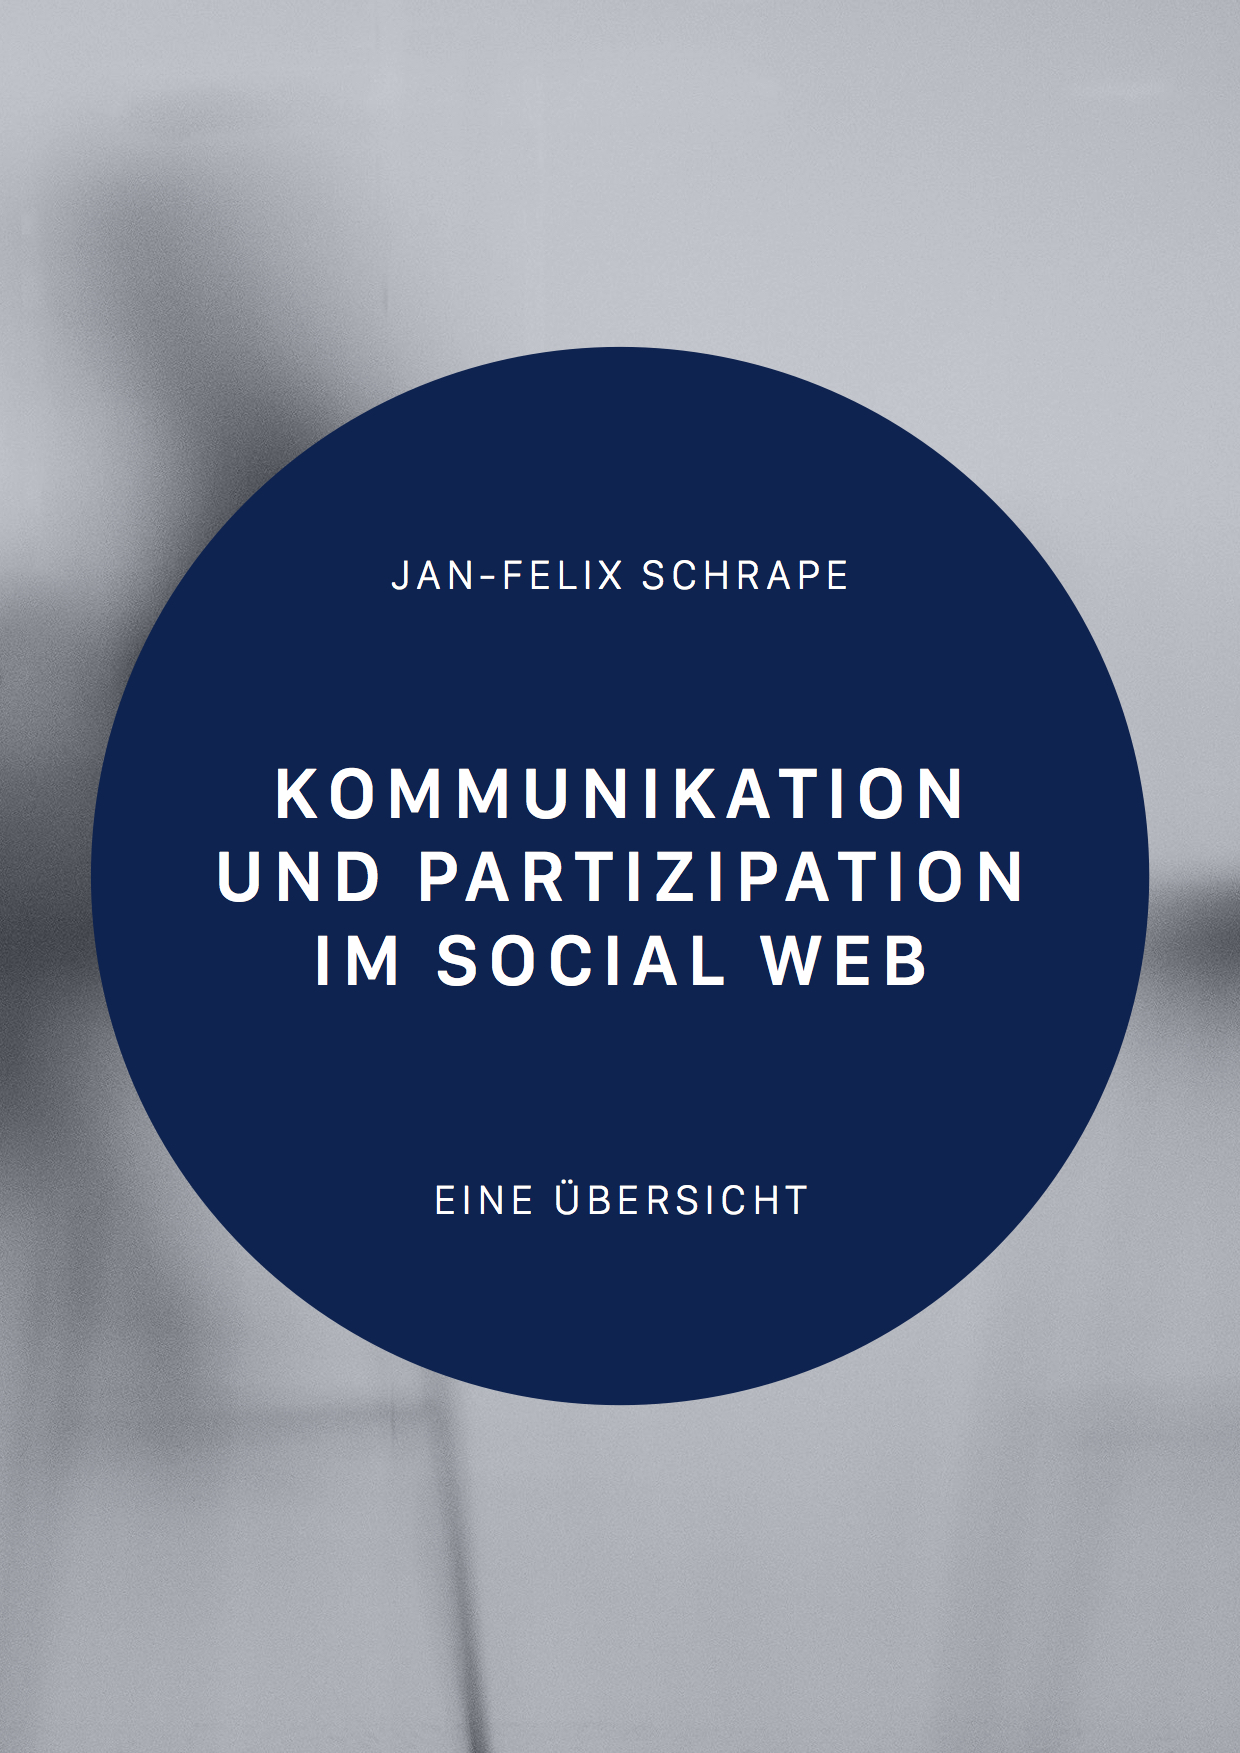 Kommunikation im Social Web